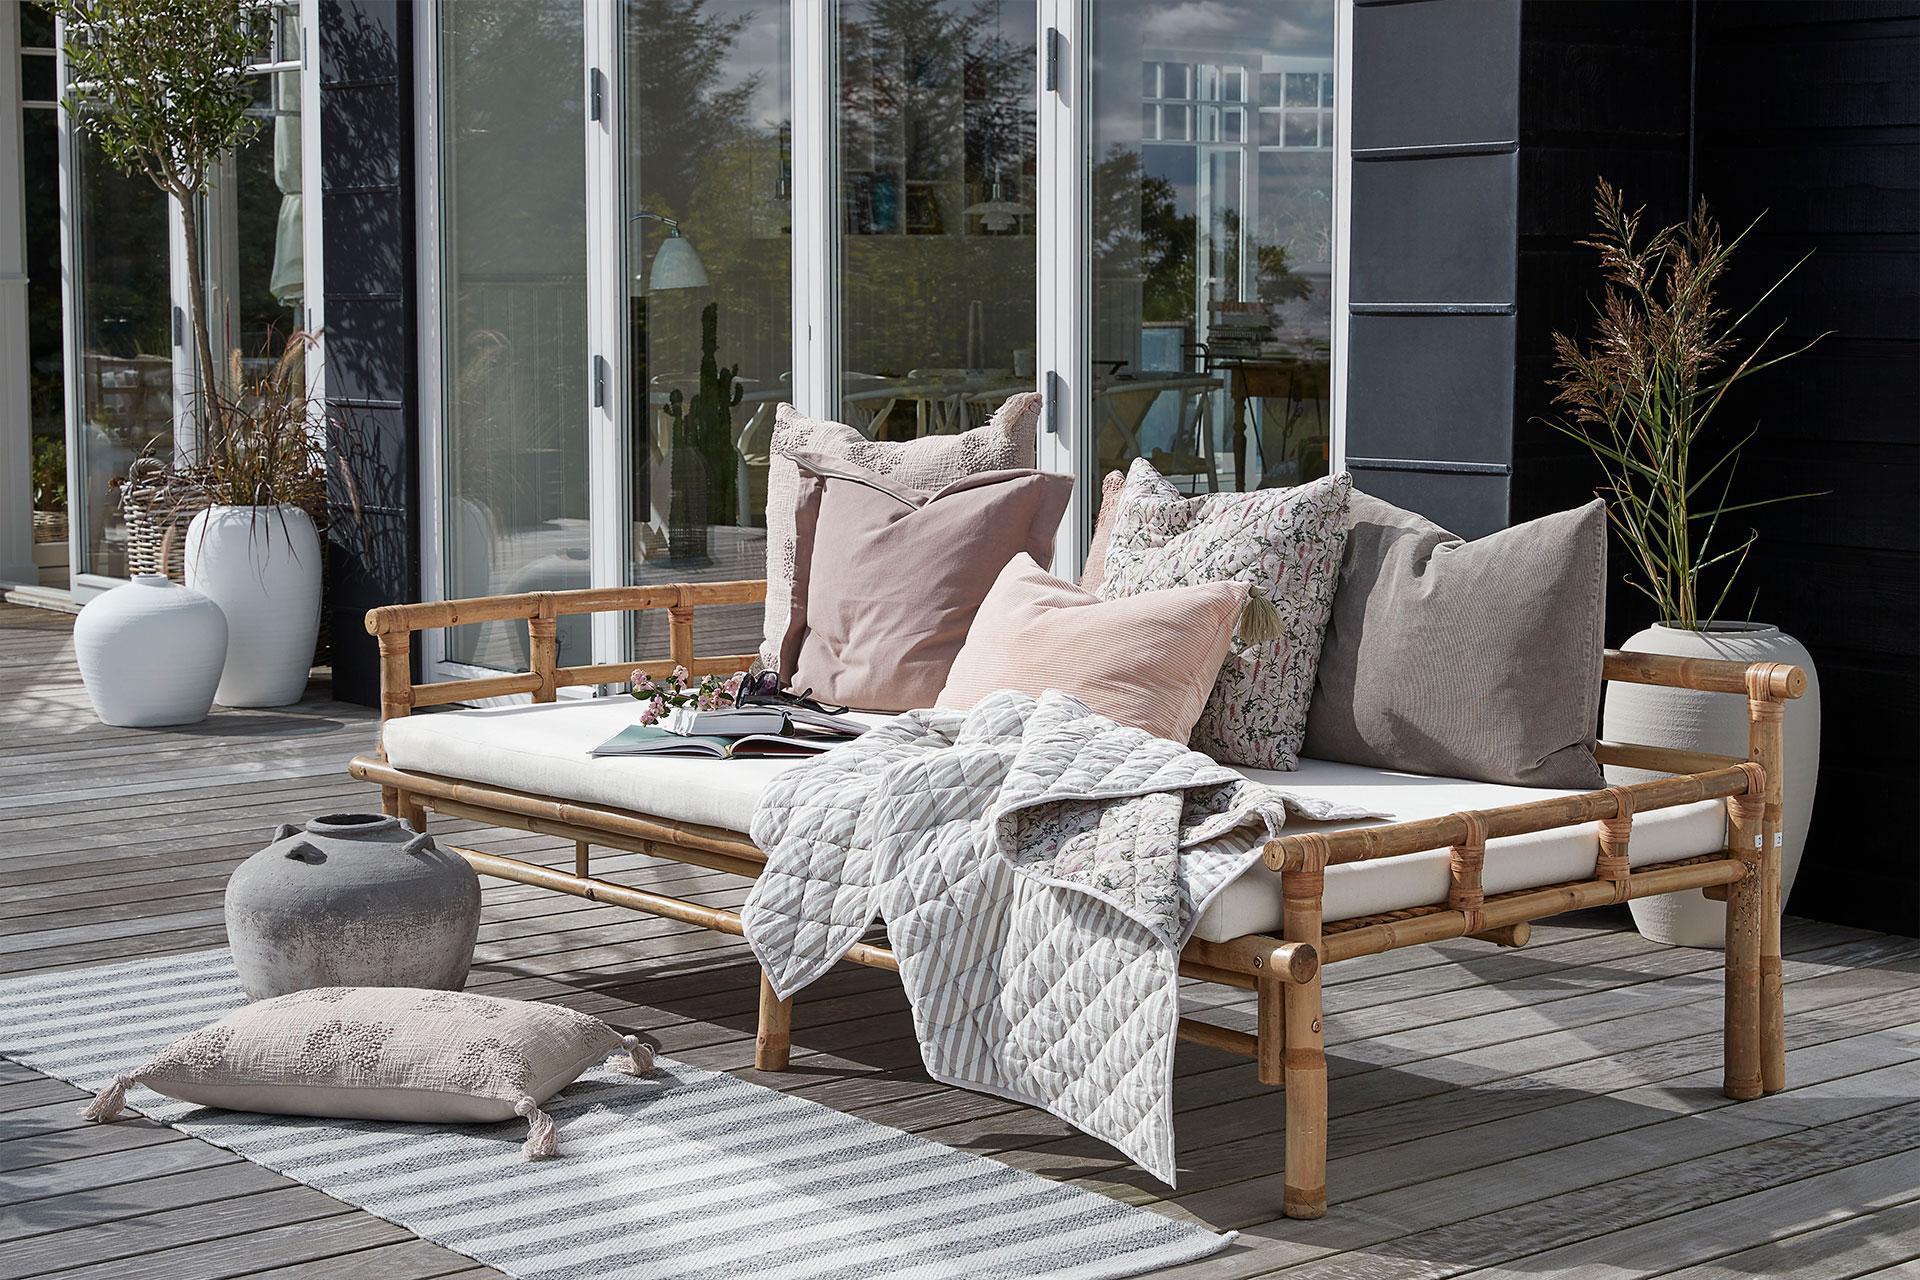 Wholesaler of bamboo furniture - Lene Bjerre